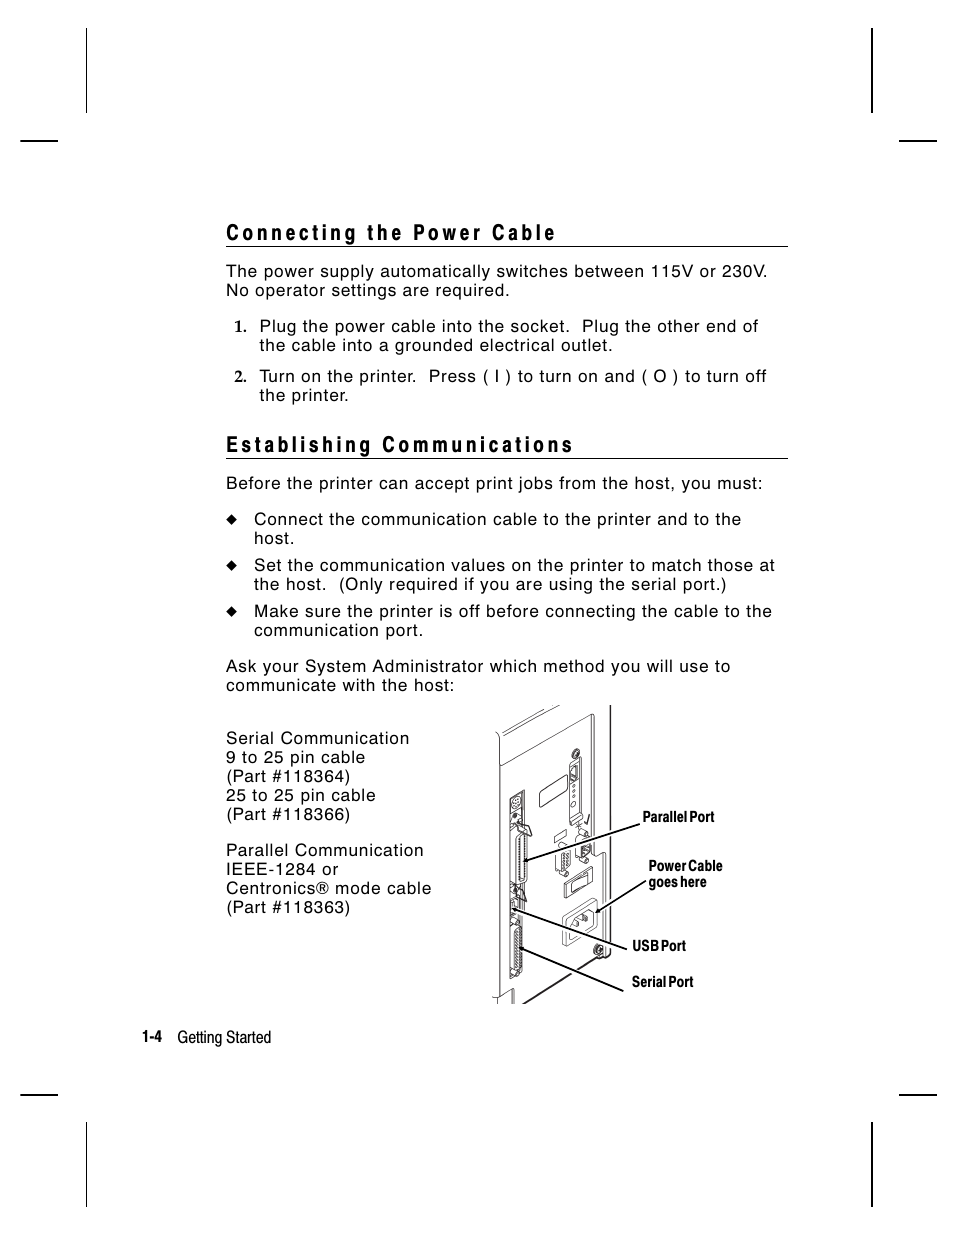 paxar monarch 9855 rfid printer user manual page 14 124 rh manualsdir com Monarch 9800 Label Printer Monarch 9800 Label Printer